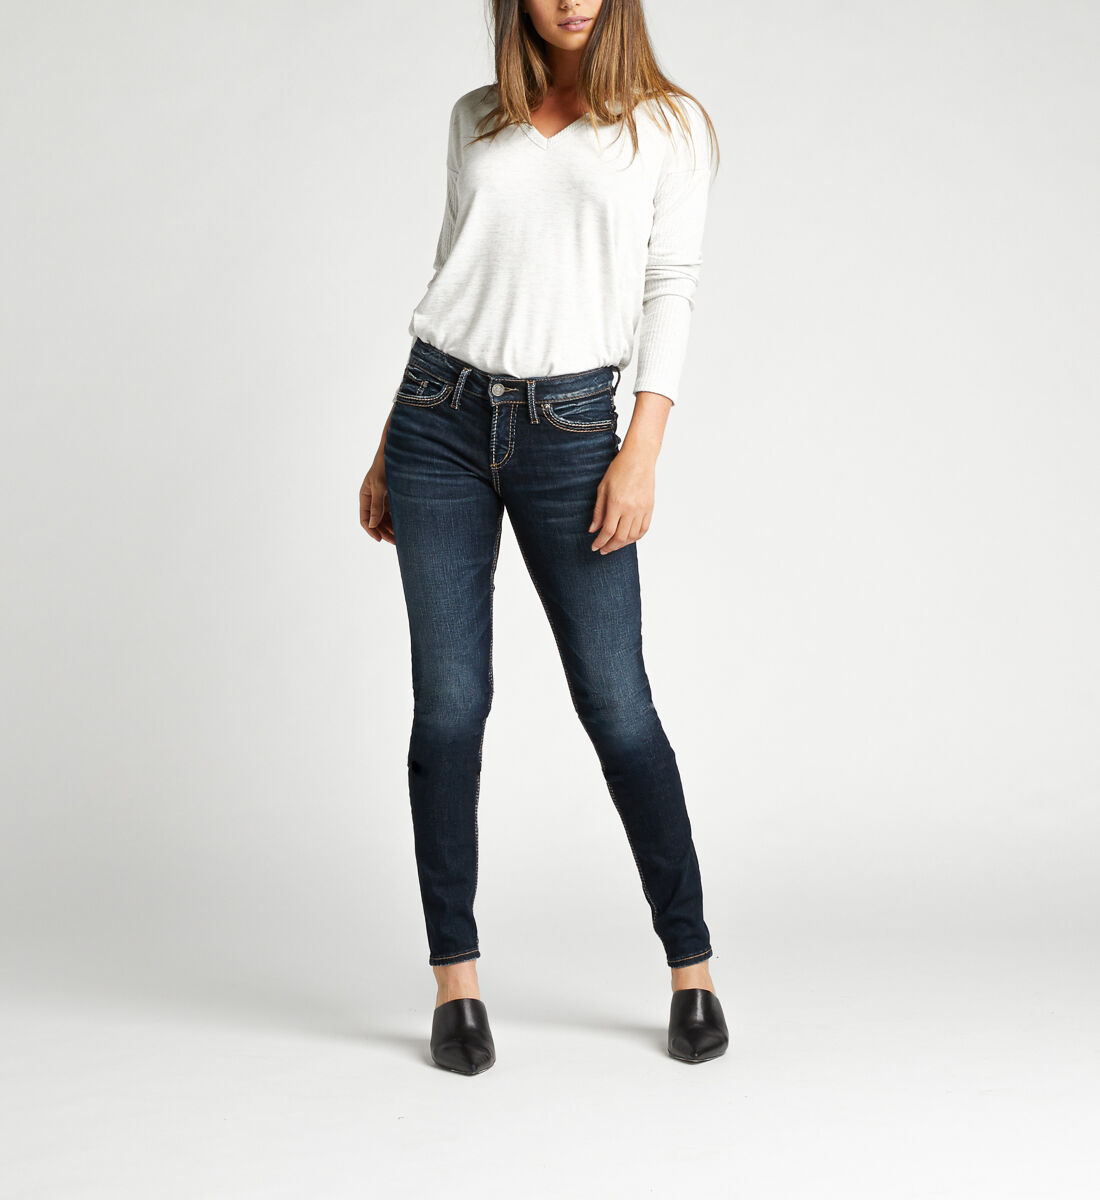 Suki Mid Rise Skinny Jeans Alt Image 1